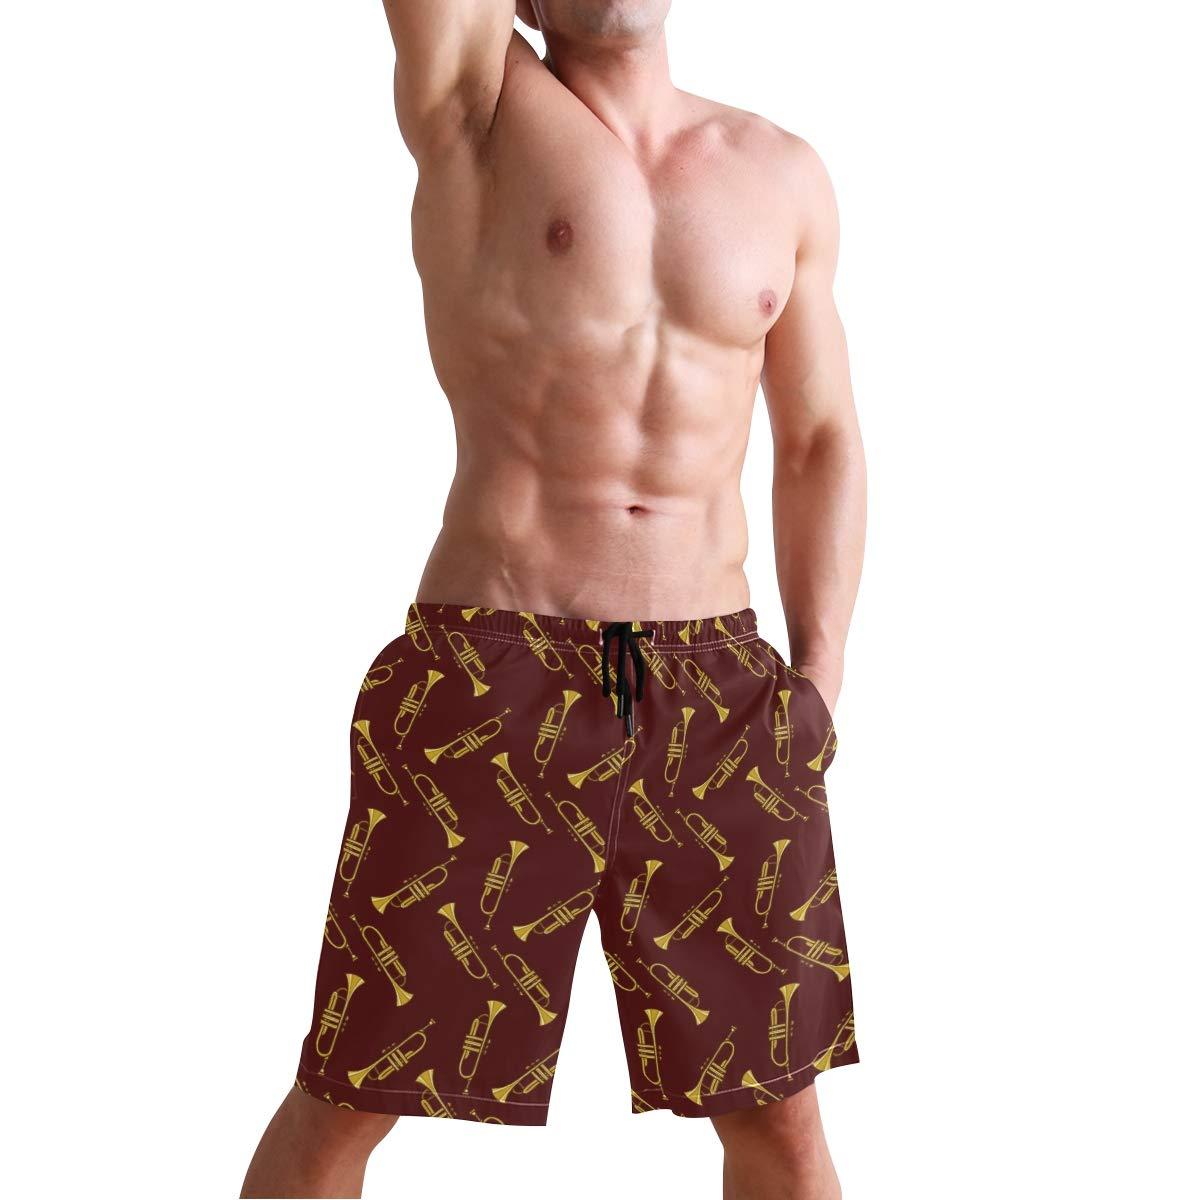 DongDongQiang Men Summer Trumpet Quick Dry Volleyball Beach Shorts Board Shorts